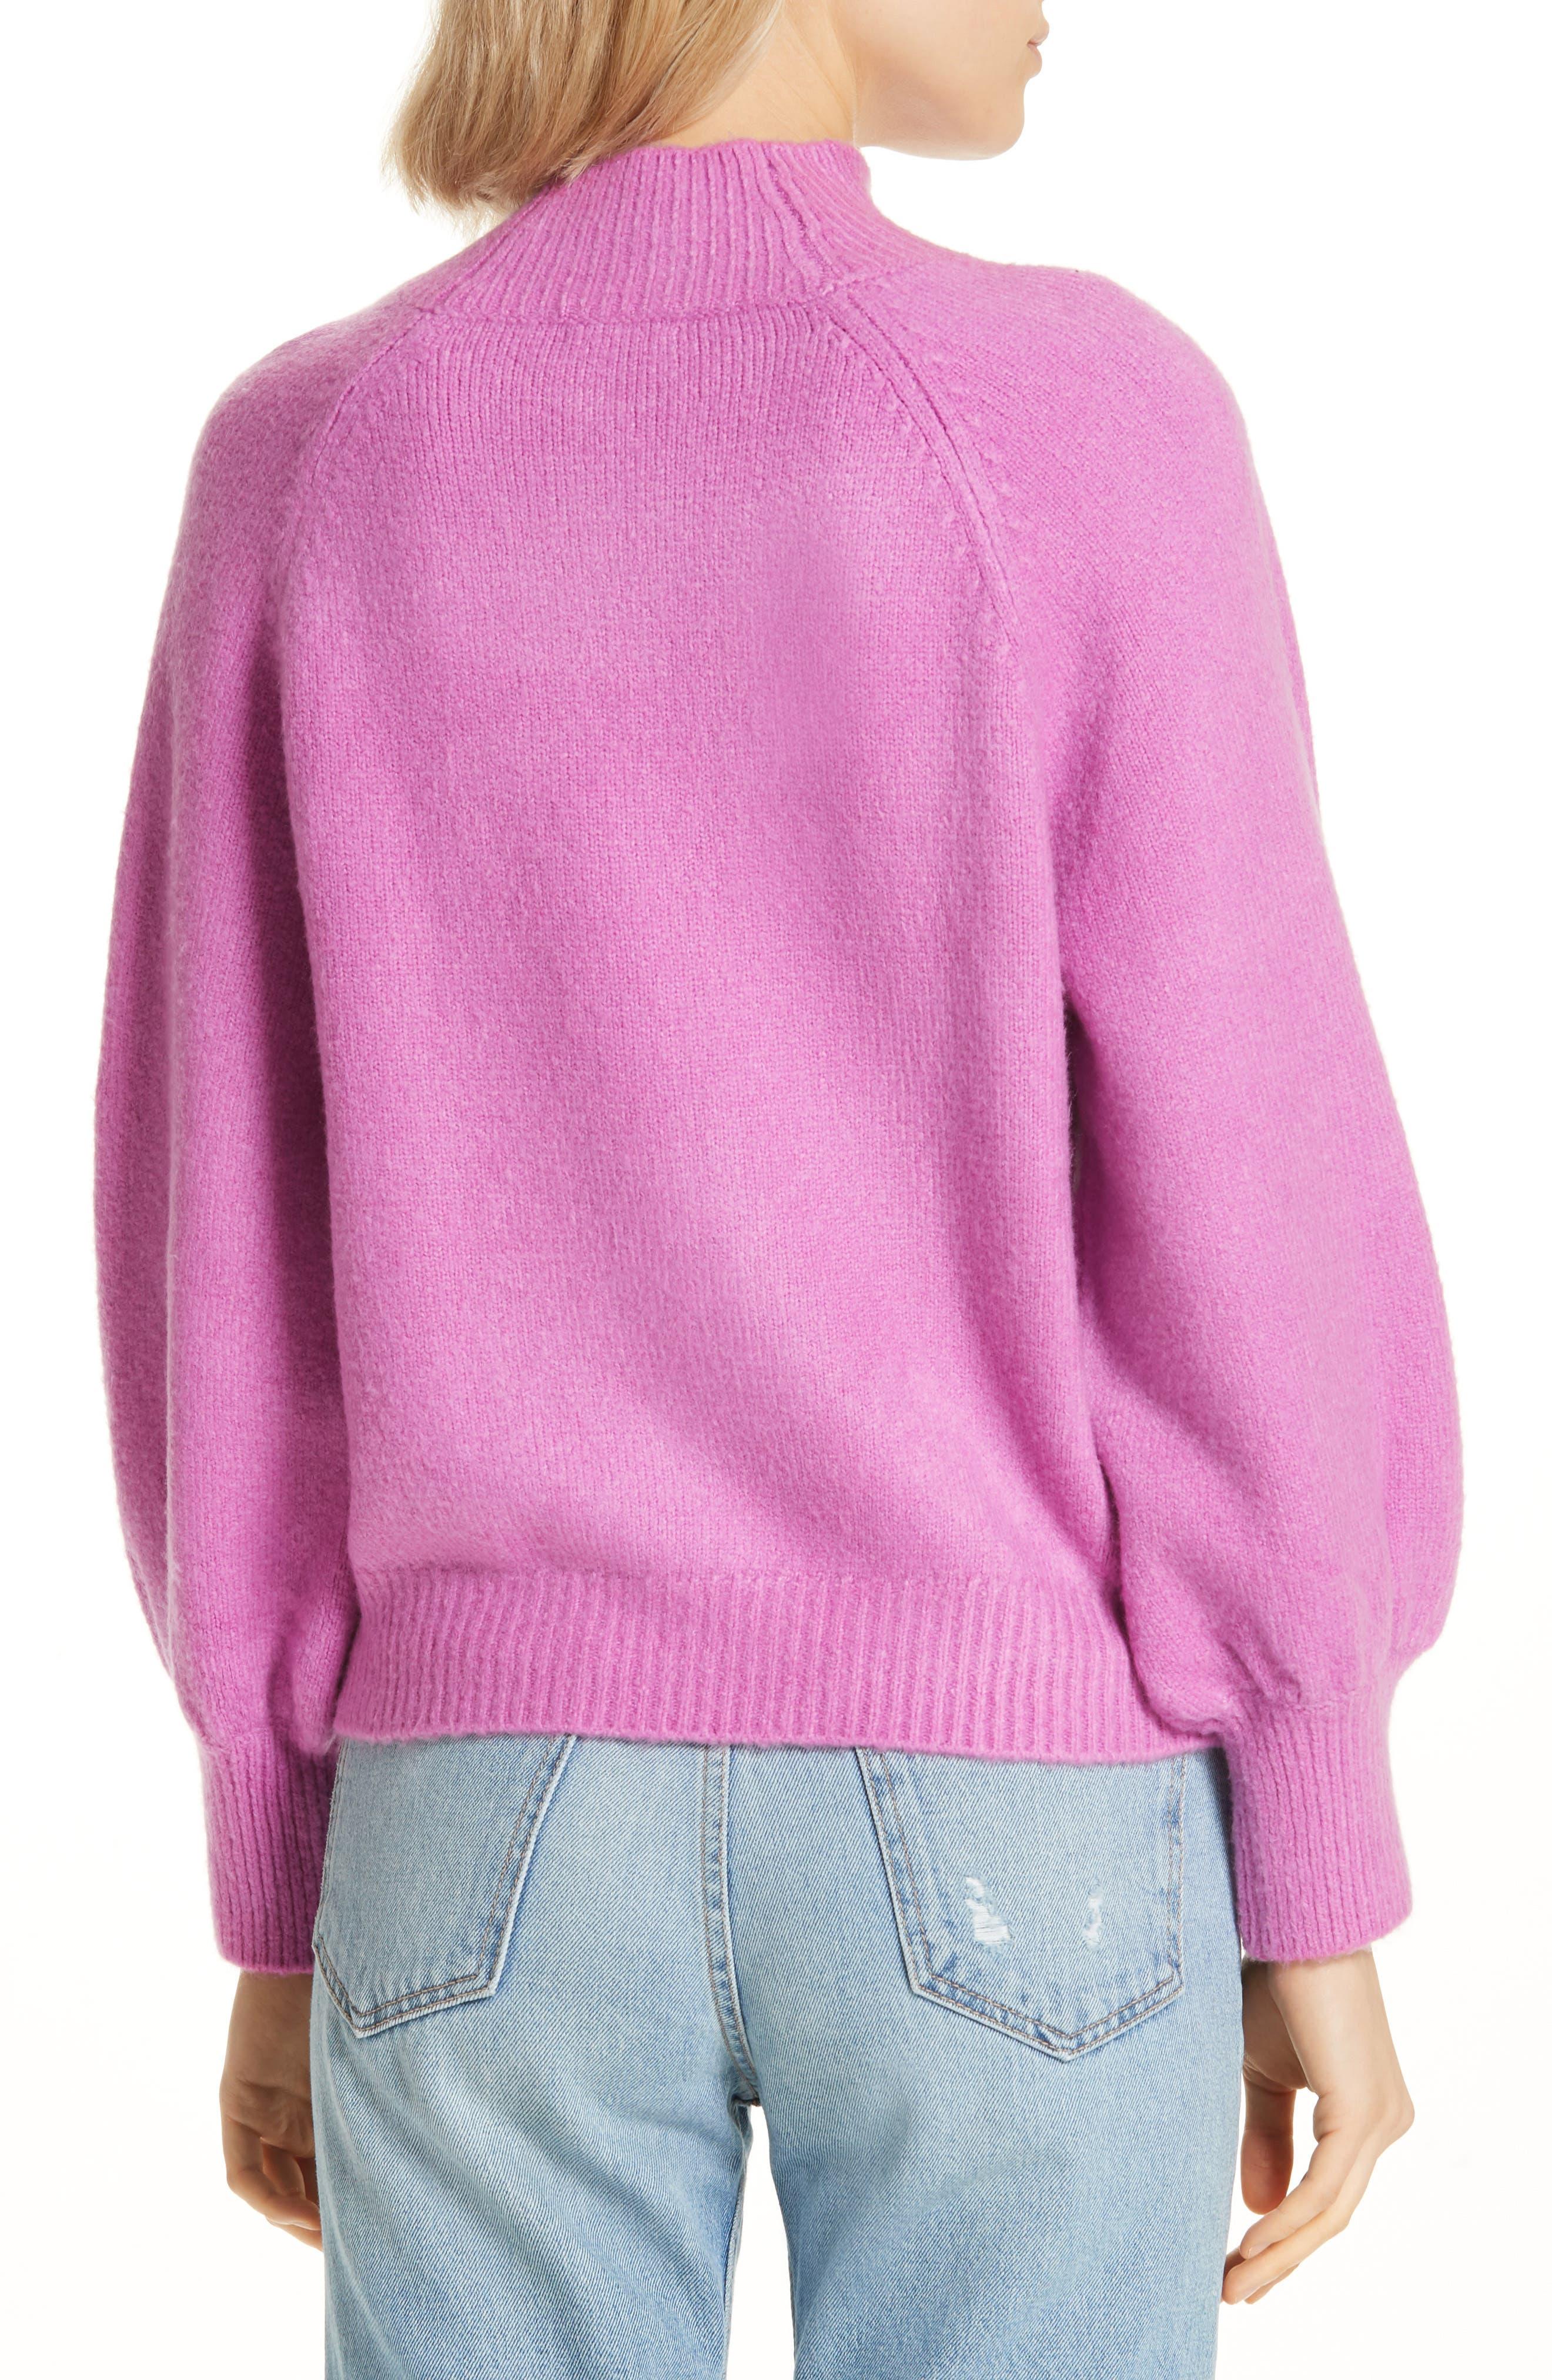 Jenlar Turtleneck Sweater,                             Alternate thumbnail 2, color,                             650